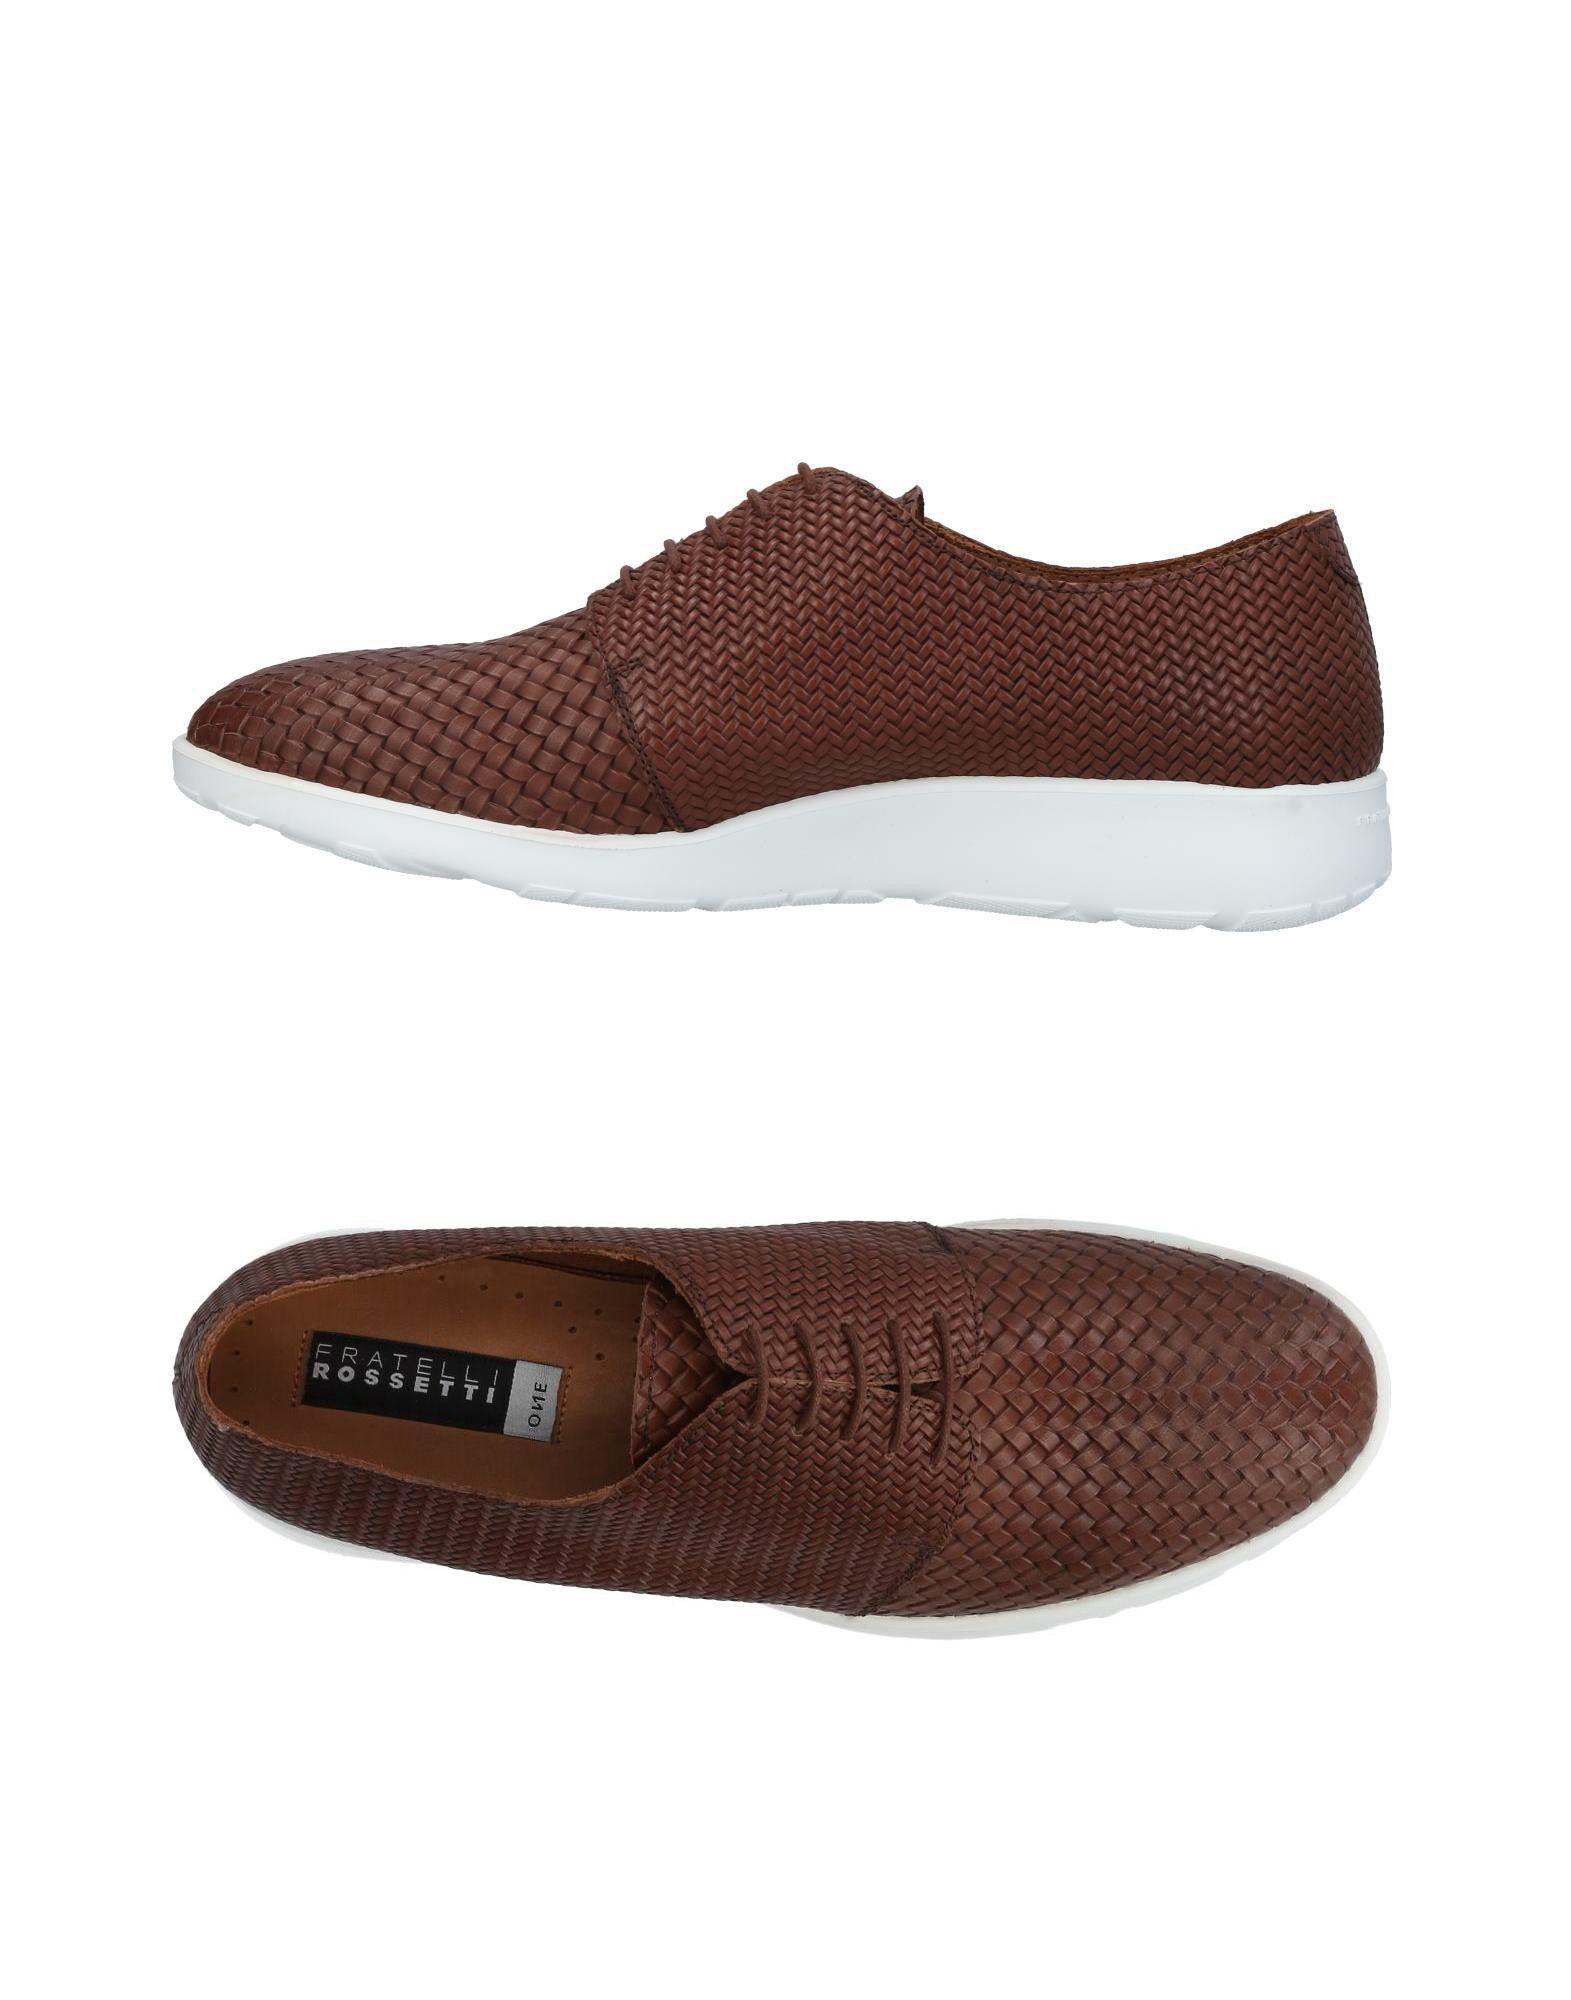 FOOTWEAR - Lace-up shoes Fratelli Rossetti CdSf4EZJ